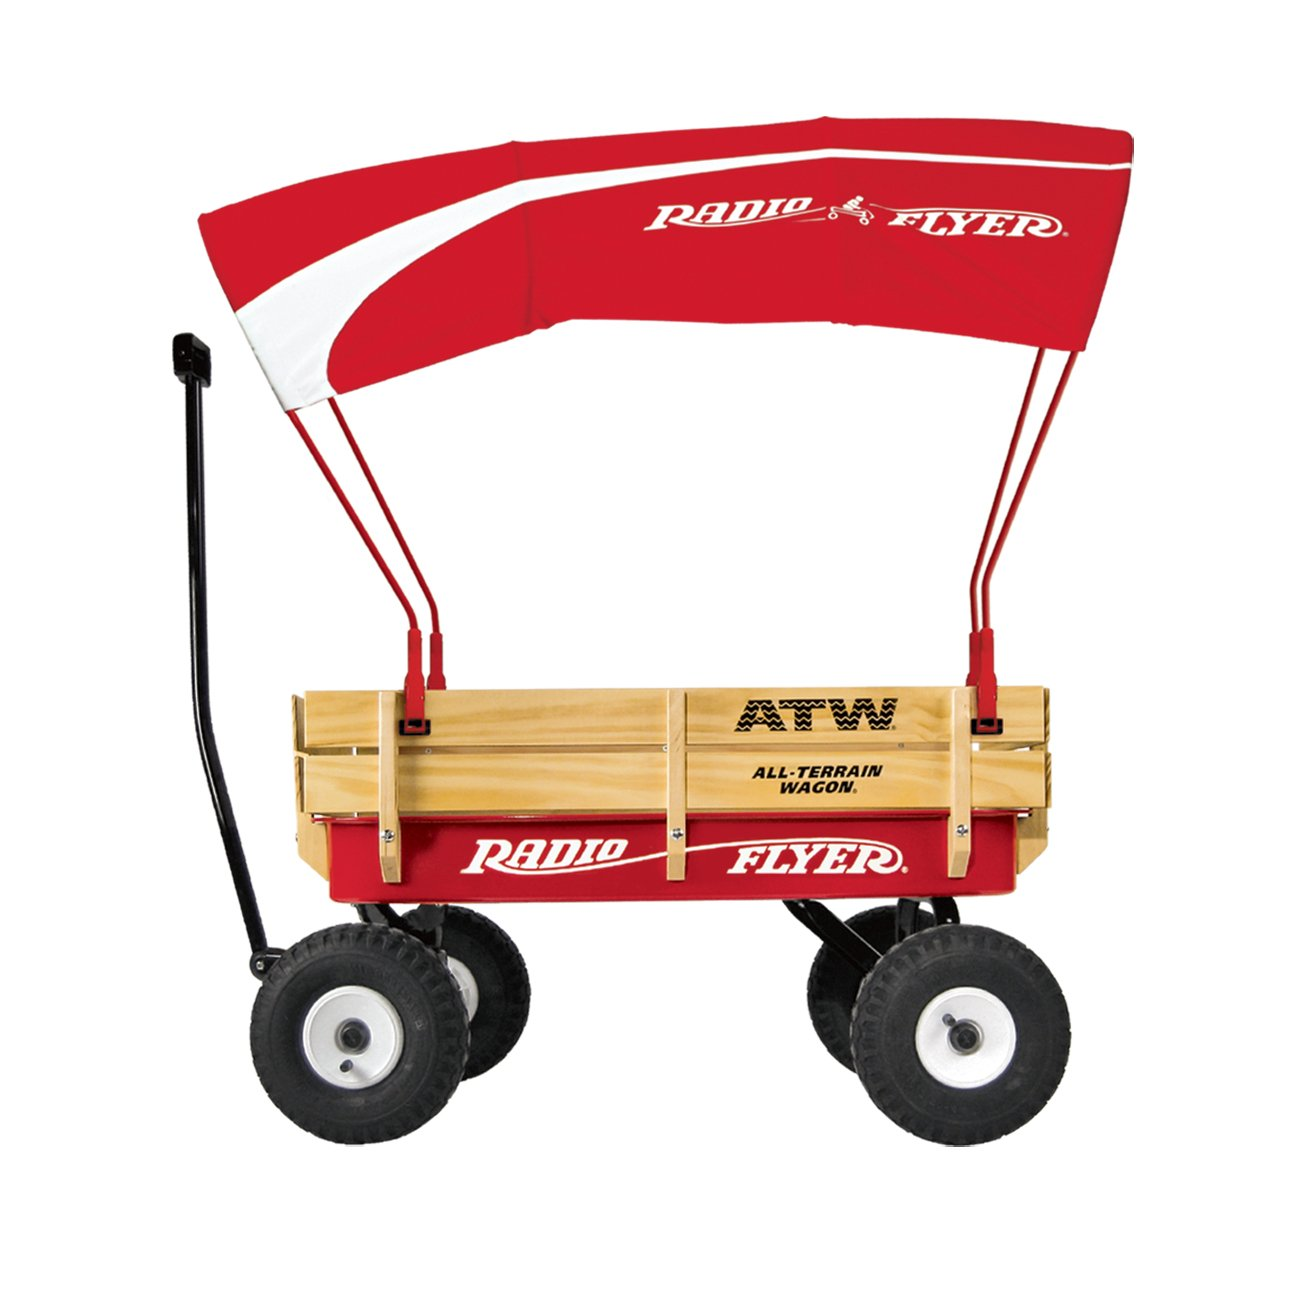 sc 1 st  Amazon.ca & Radio Flyer Wagon Canopy Ride-On Accessories - Amazon Canada